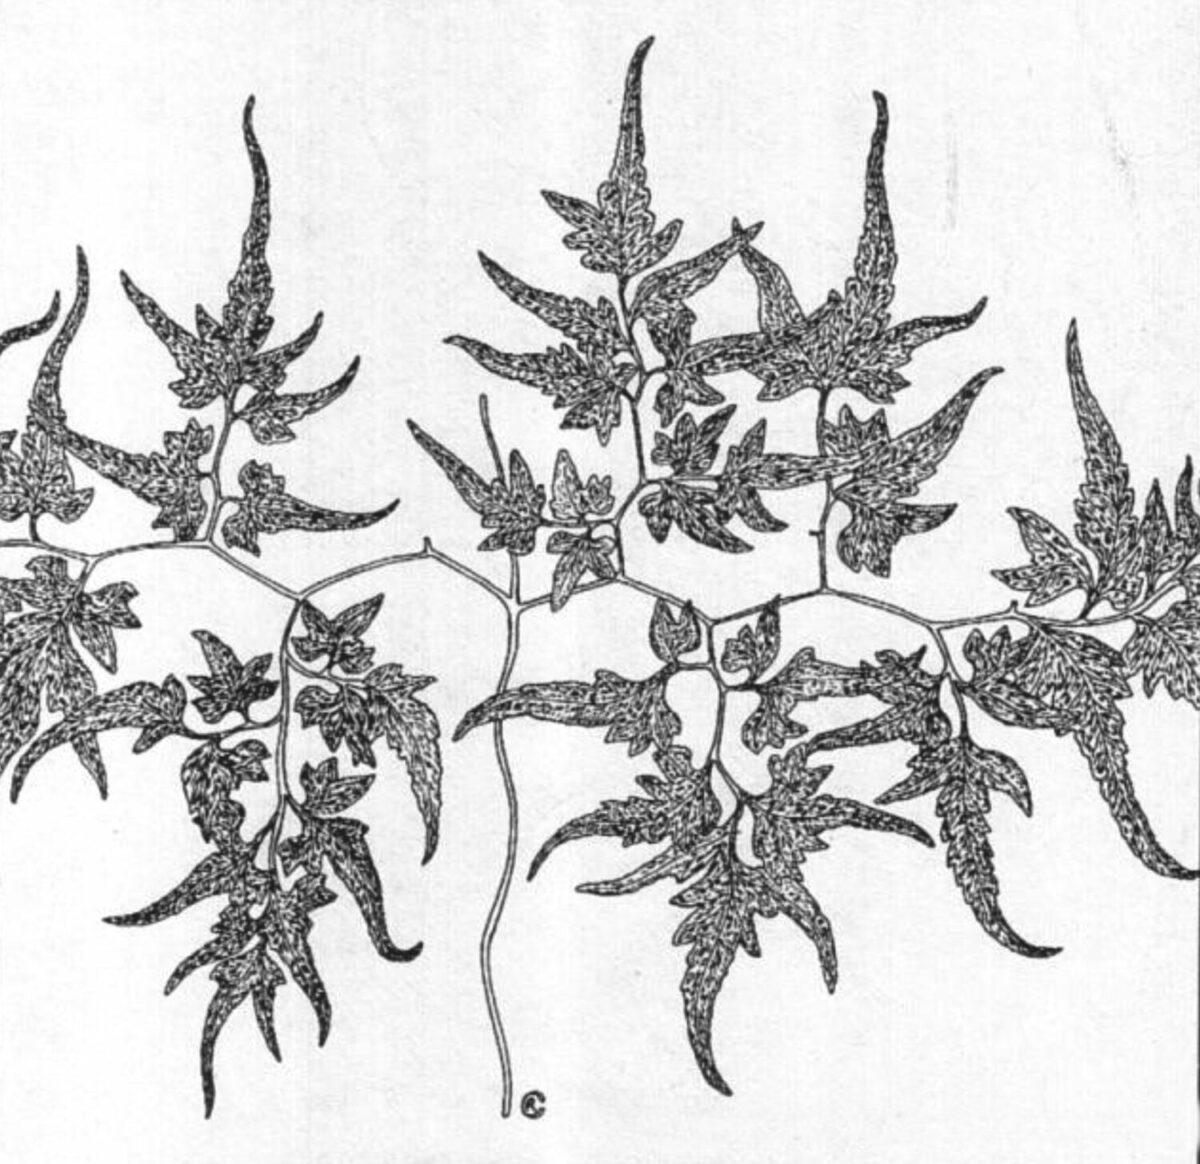 cropped-Japanese-Climbing-Fern-Lygodium-japonicum-e1598334602783.jpg